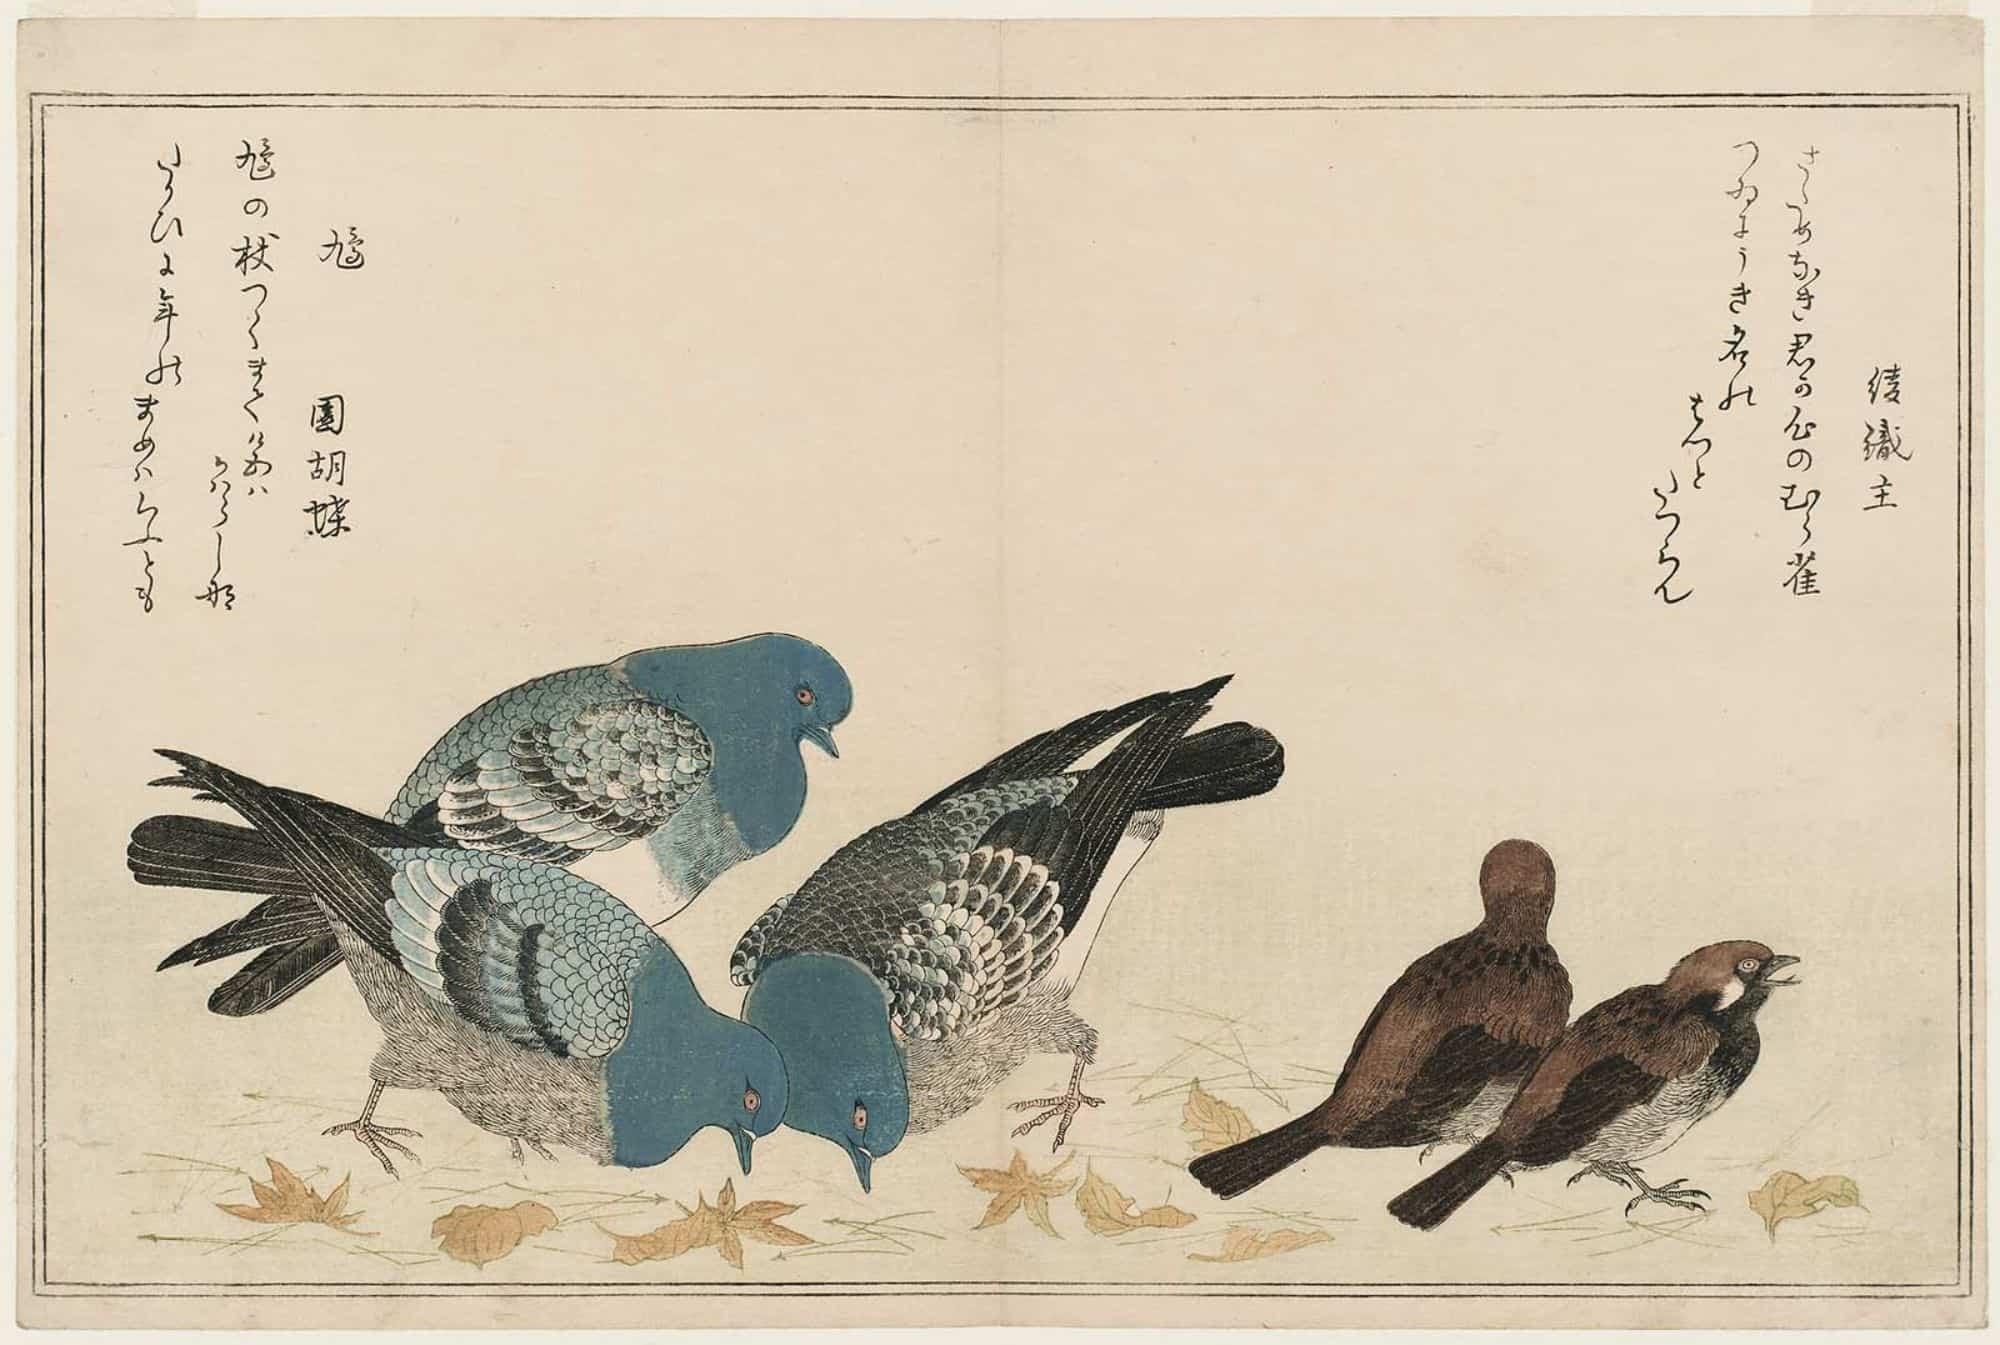 Sparrows (Murasuzume) and Pigeons (Hato), Kitagawa Utamaro, c.1790,kacho-e